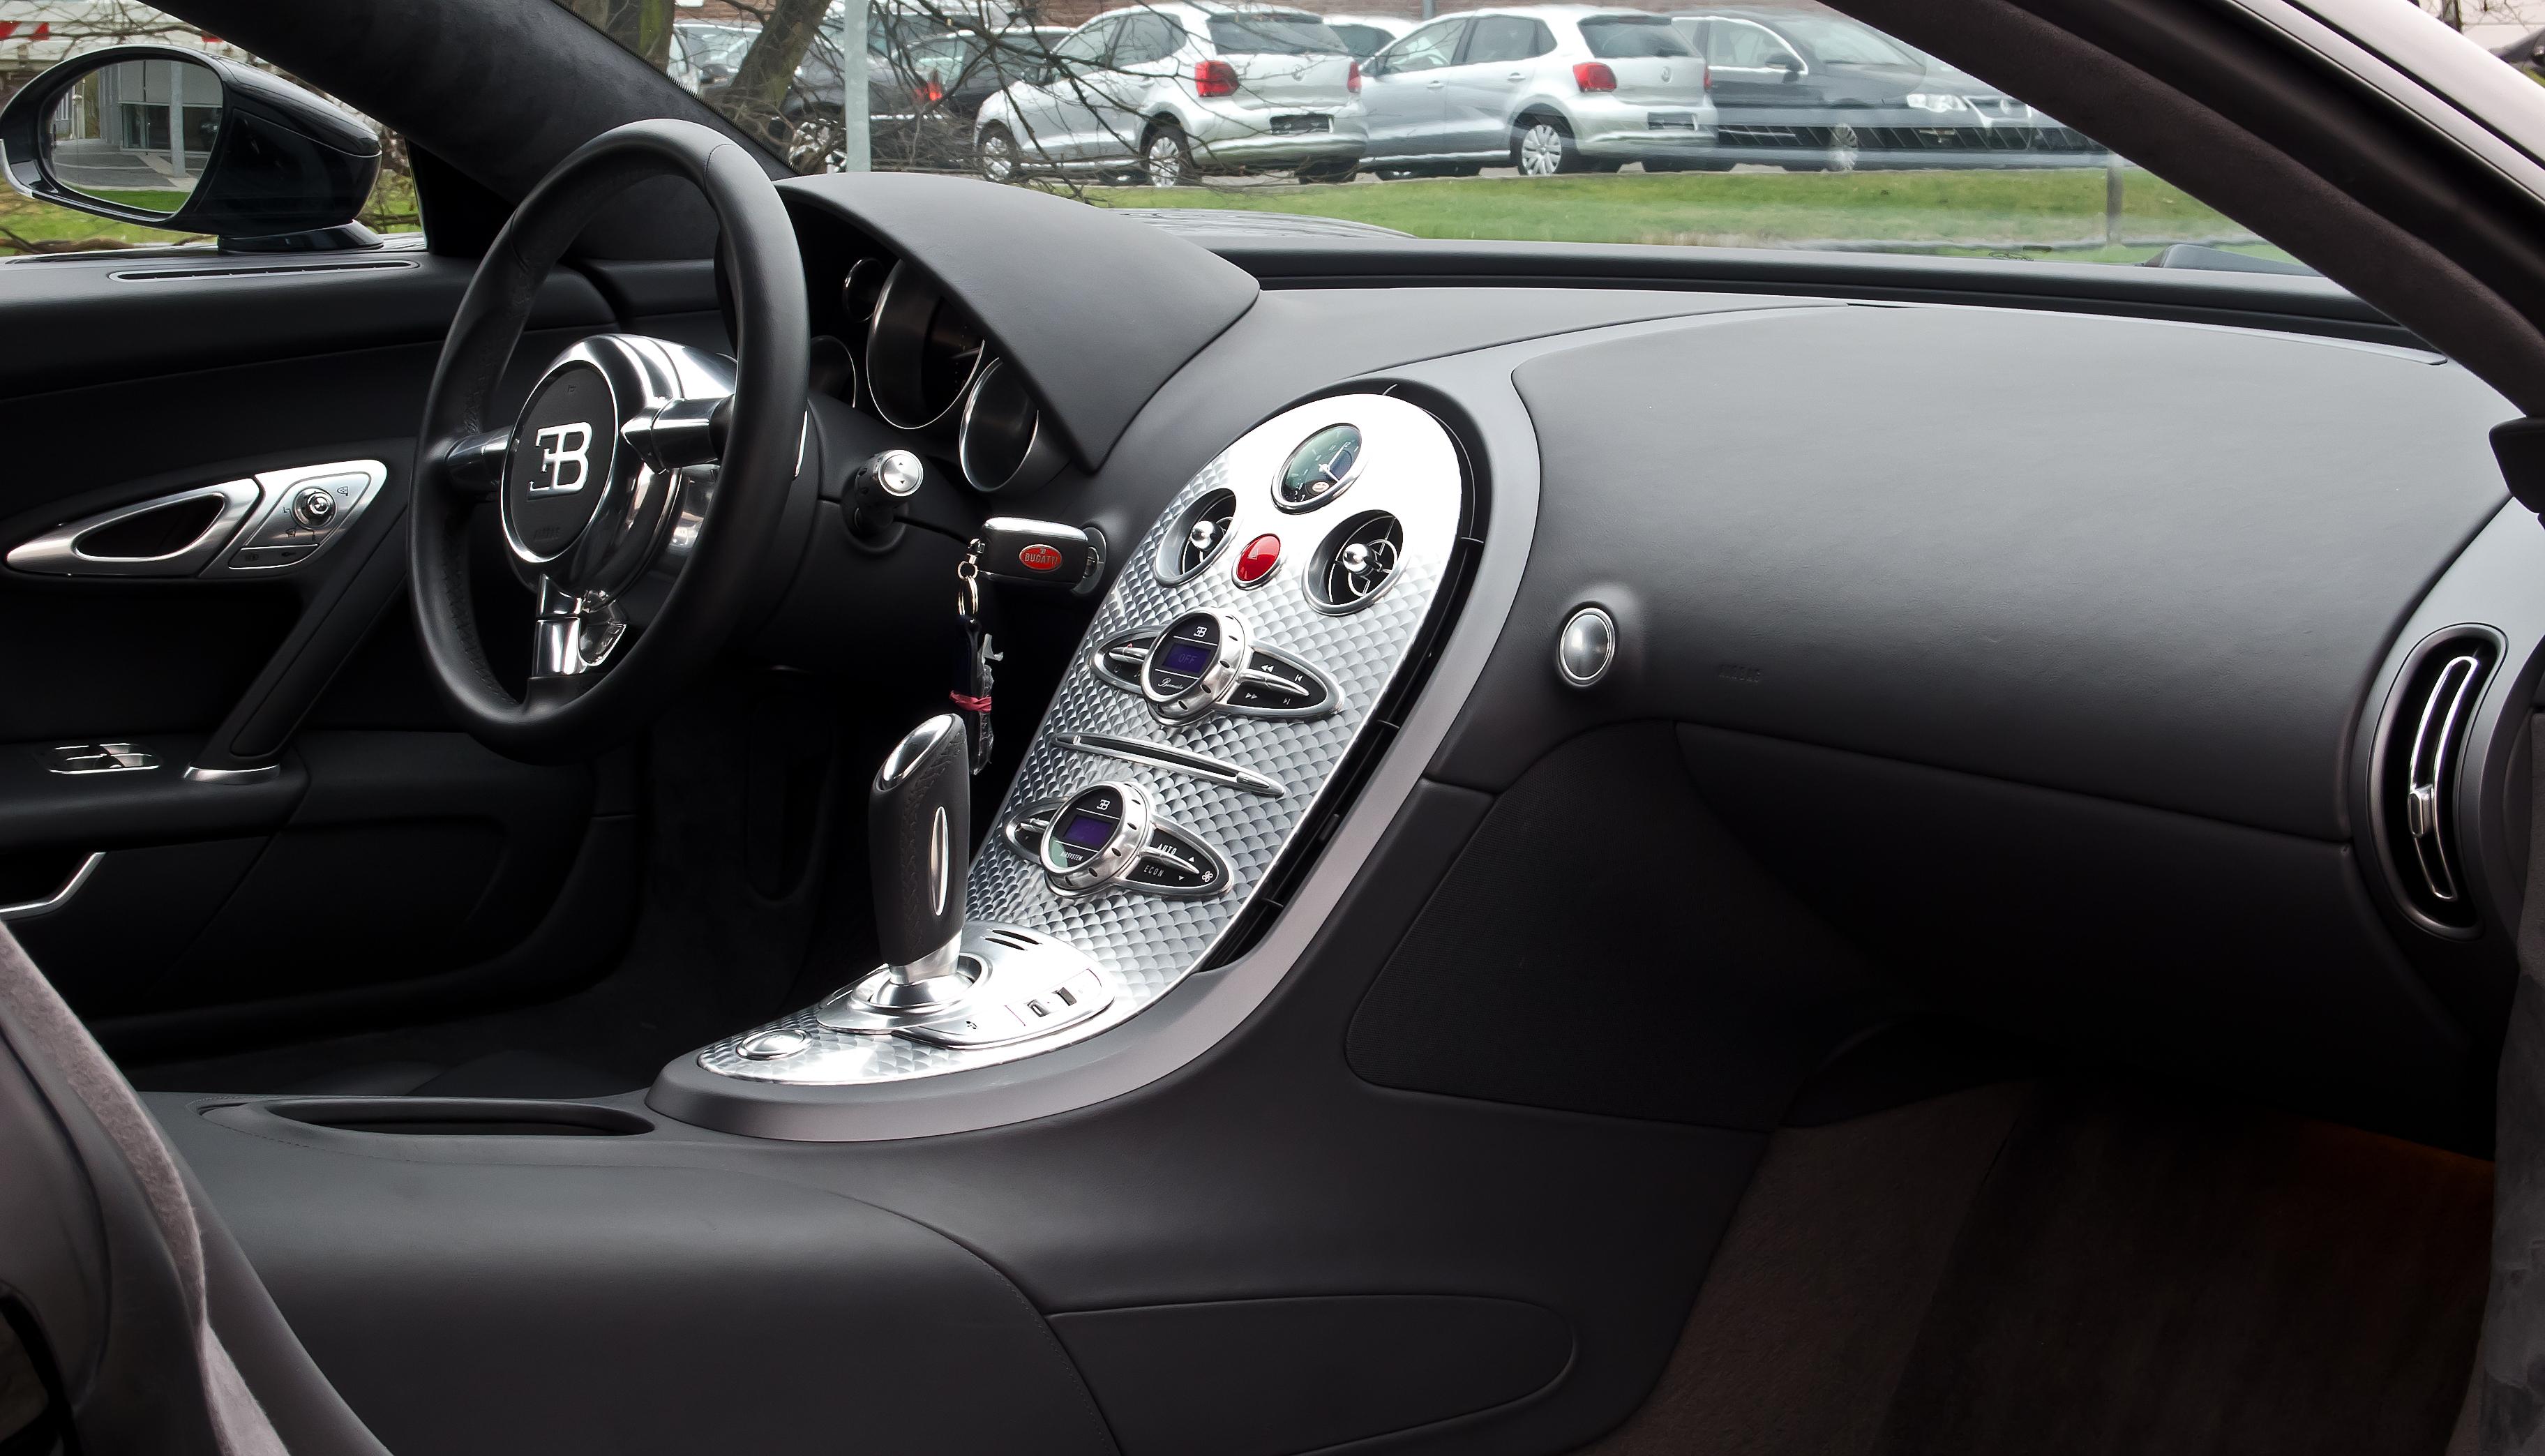 File:Bugatti Veyron 16.4 – Innenraum, 5. April 2012, Düsseldorf.jpg ...